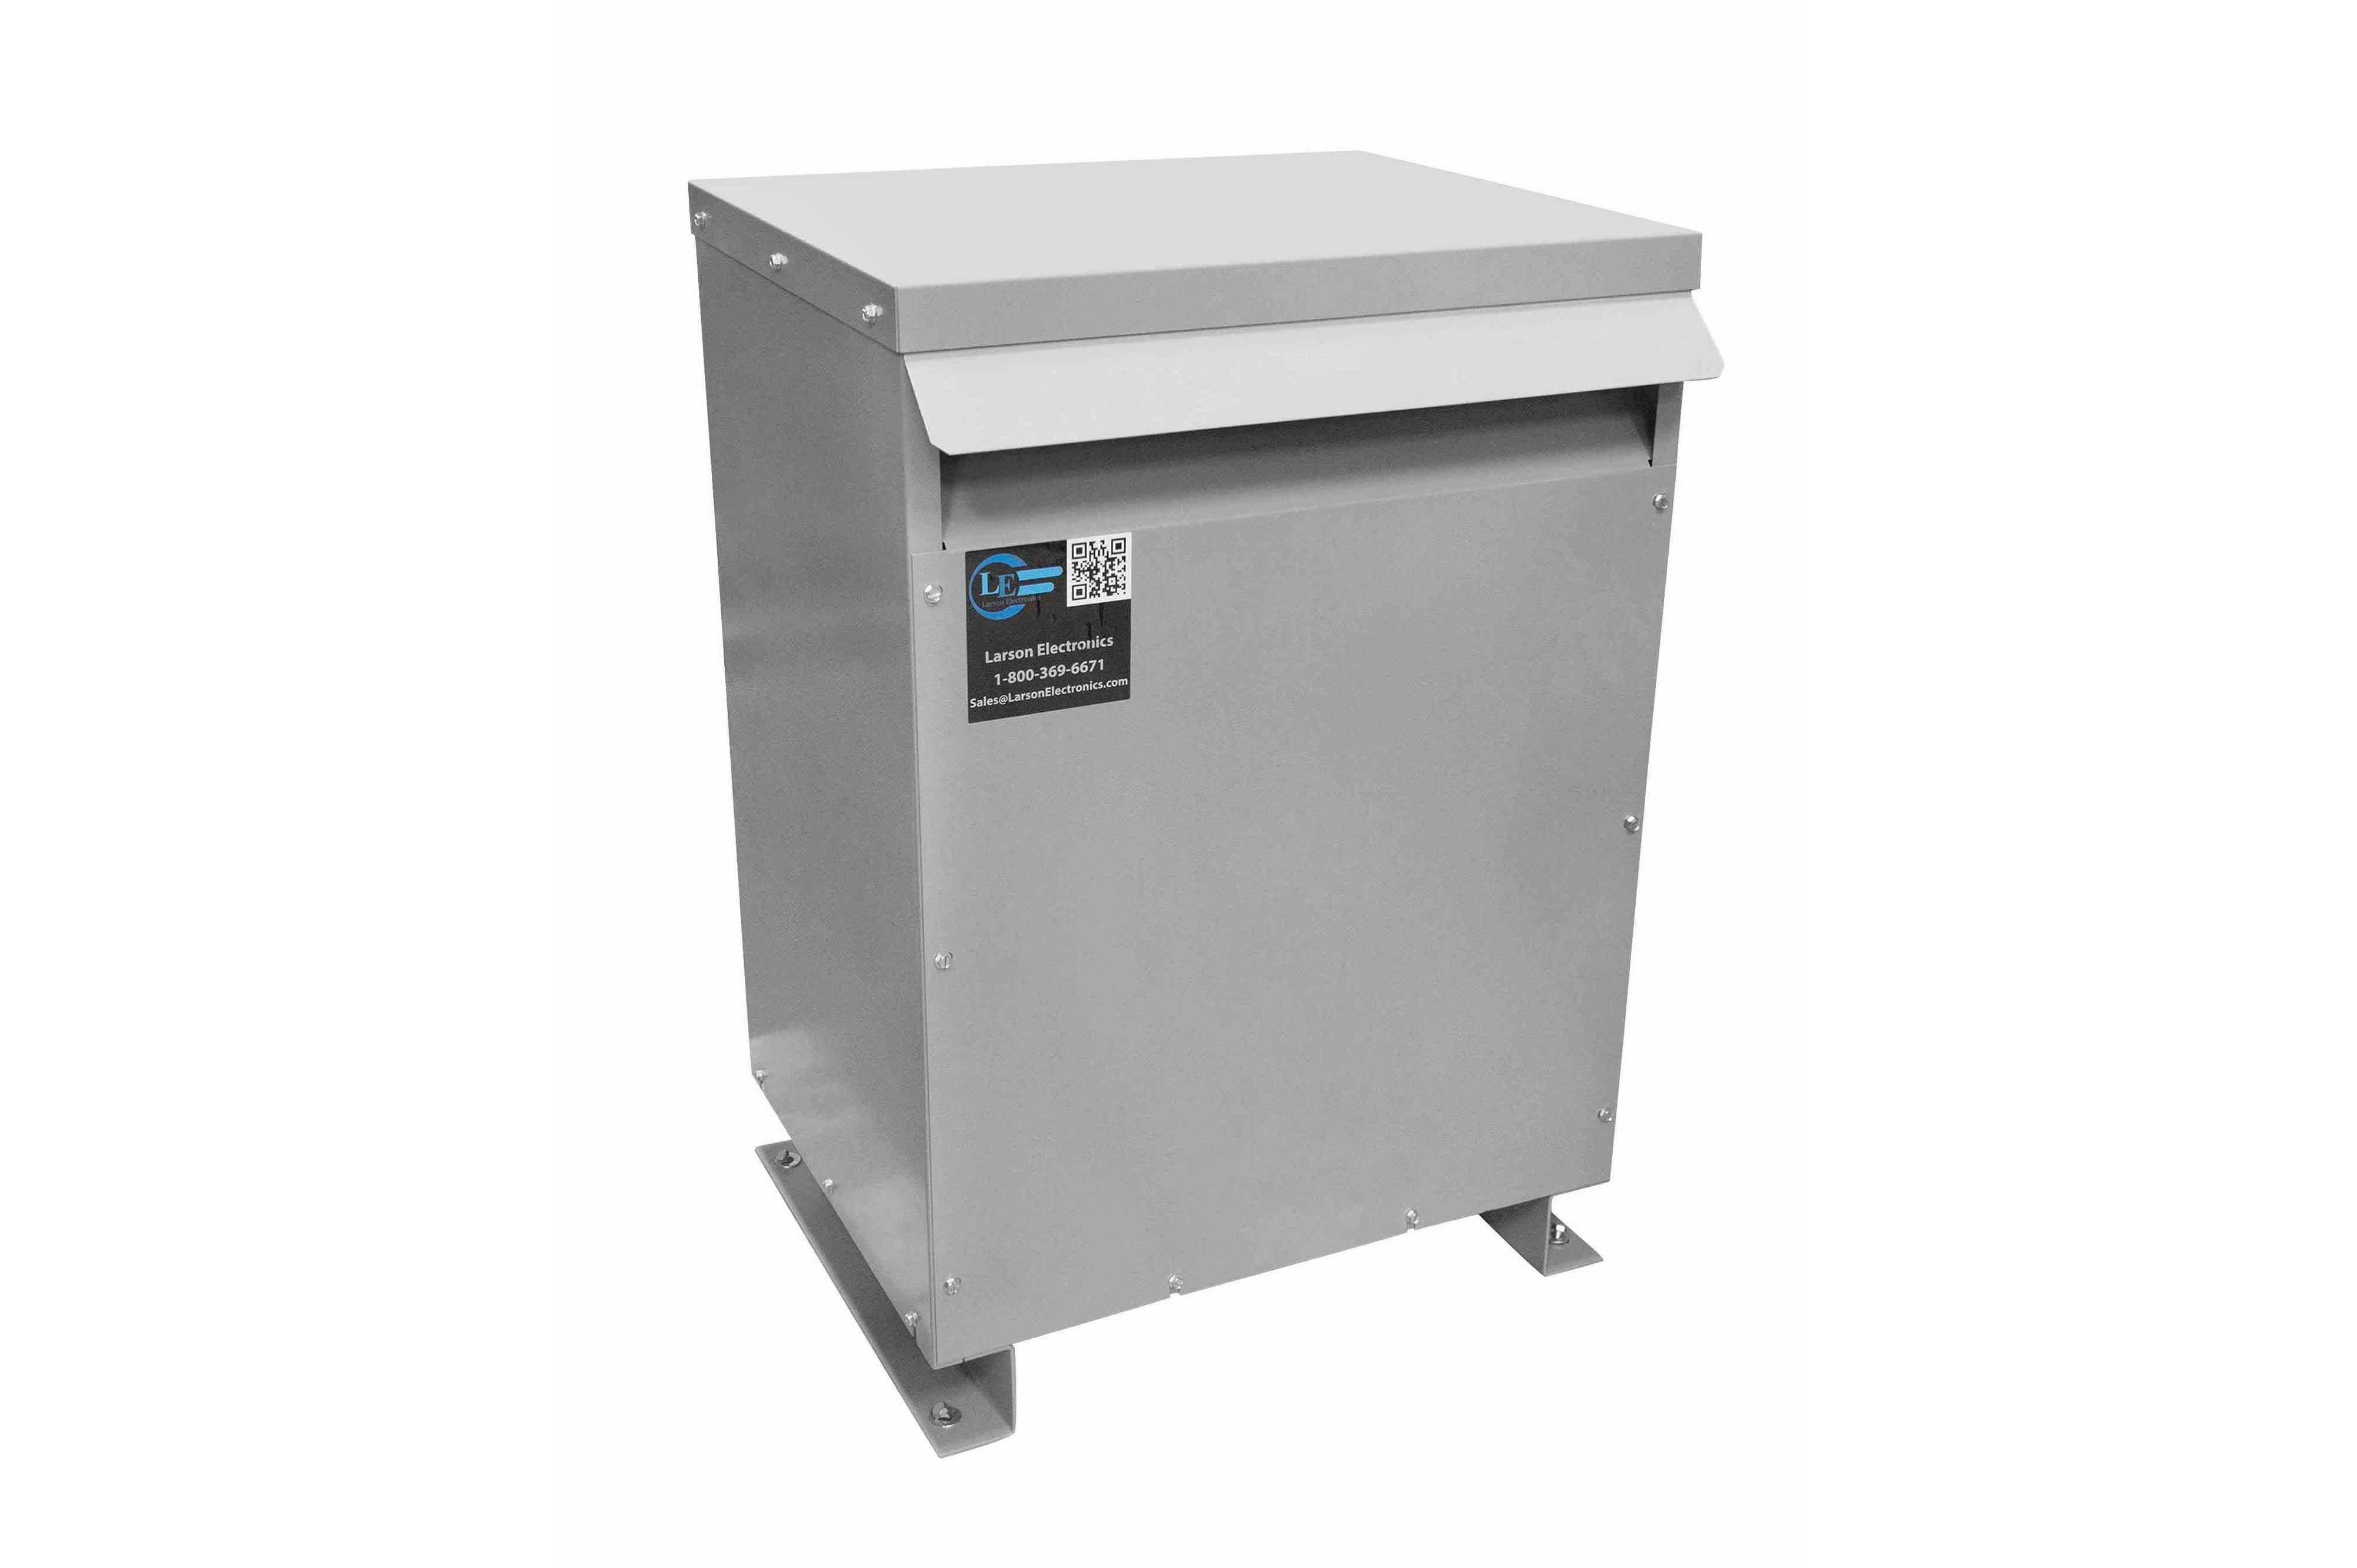 12 kVA 3PH Isolation Transformer, 240V Wye Primary, 400V Delta Secondary, N3R, Ventilated, 60 Hz